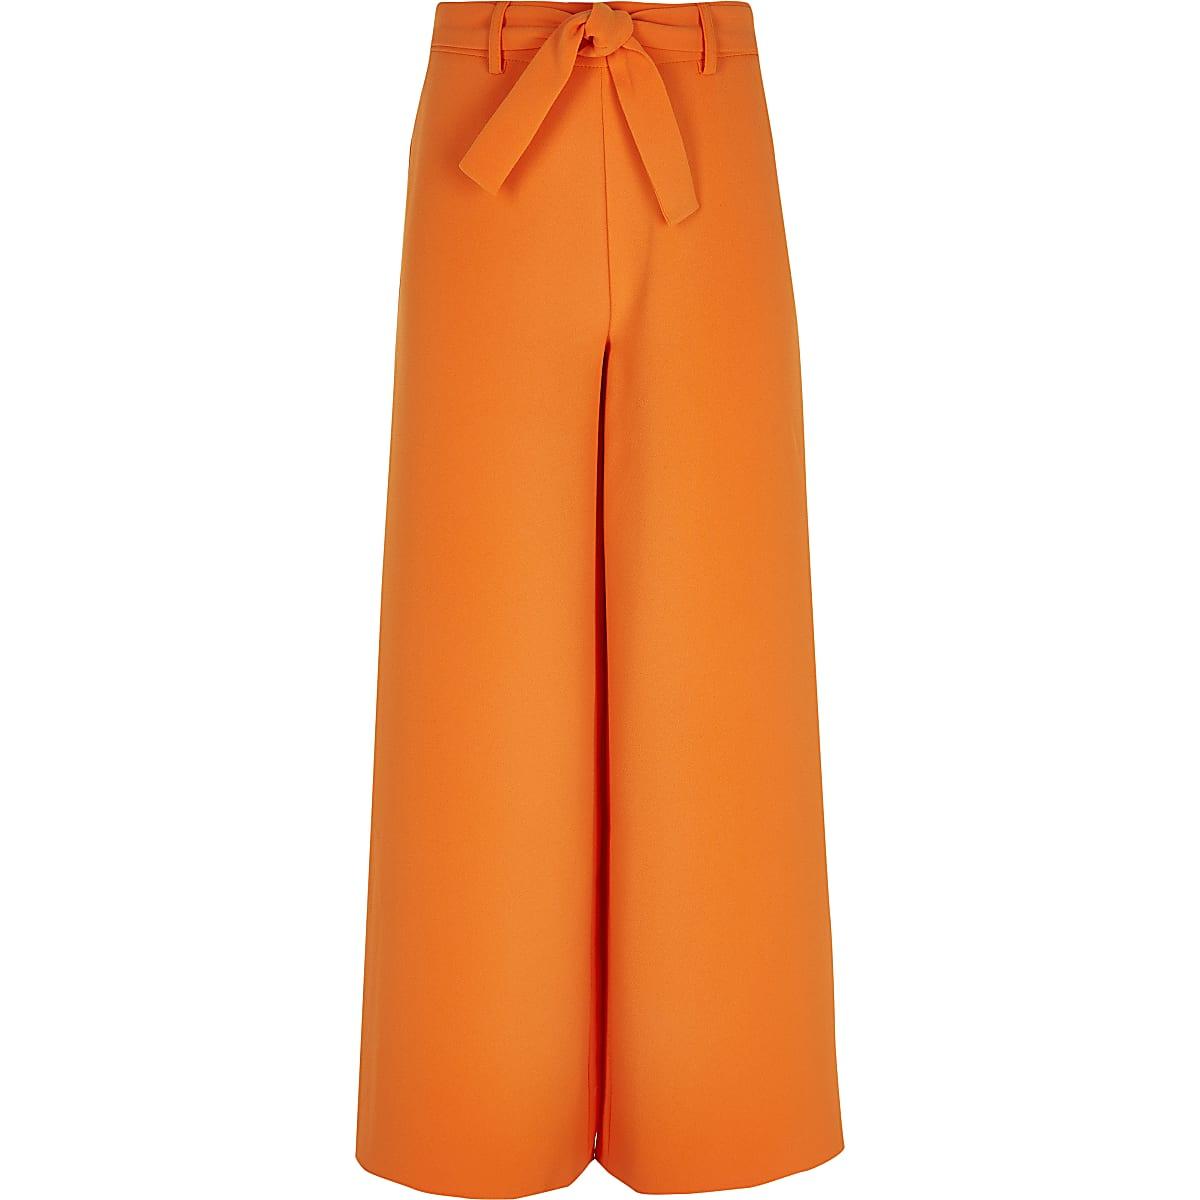 Girls orange tie waist wide leg pants